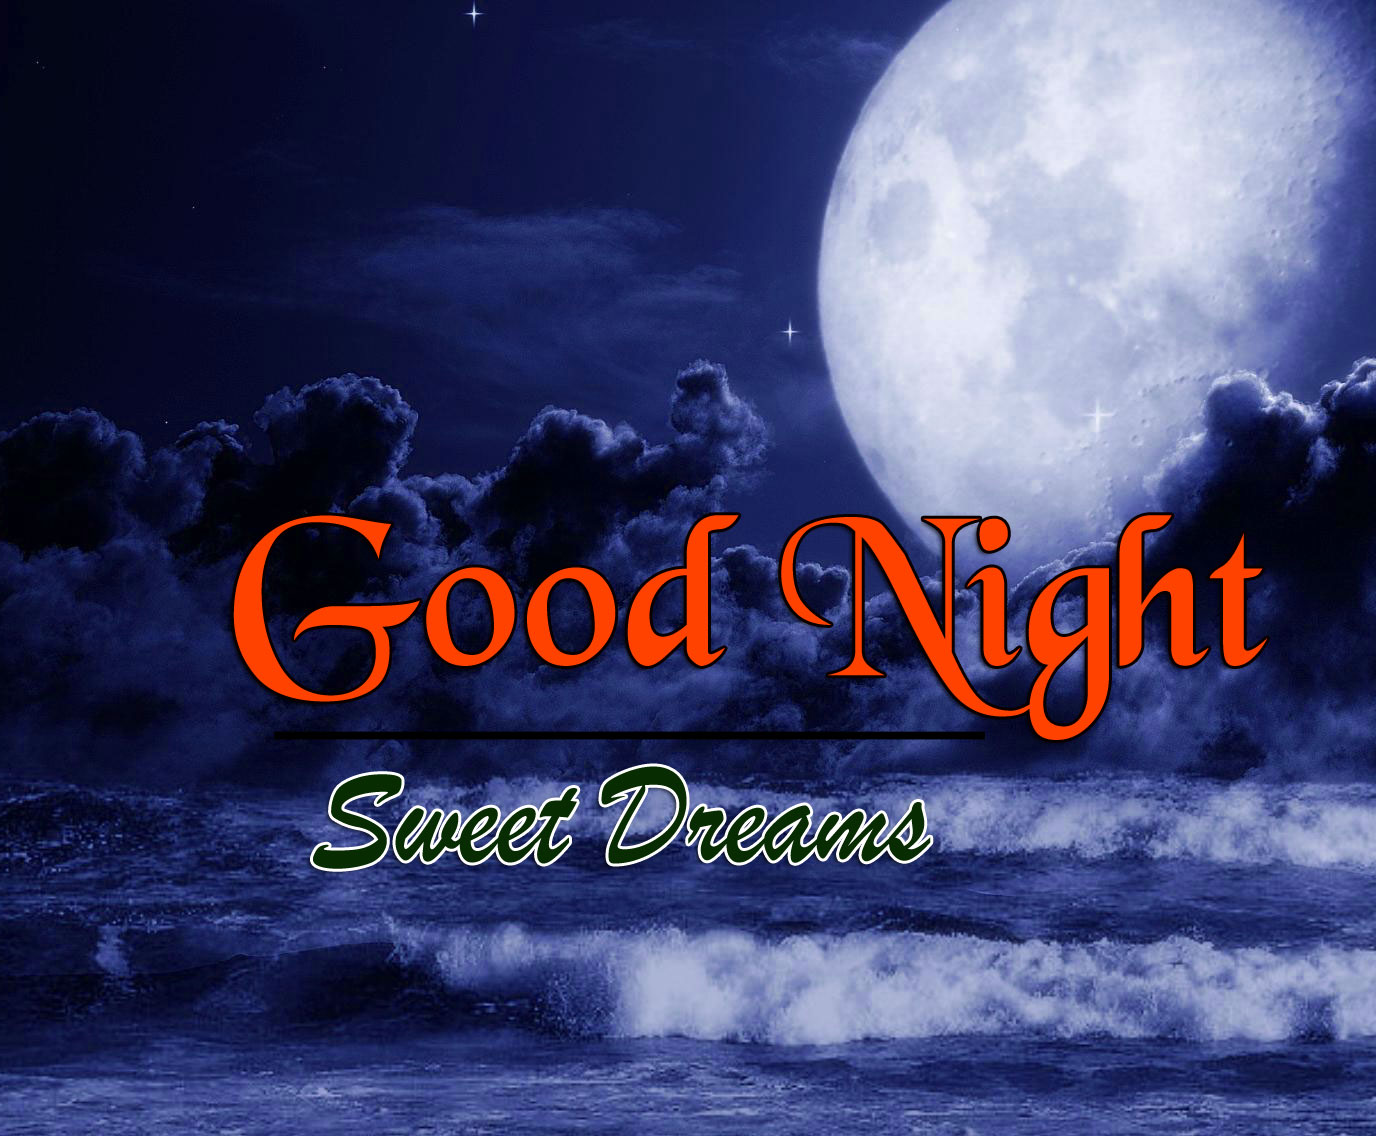 Best Qualiity Good Night Wishes Wallpaper